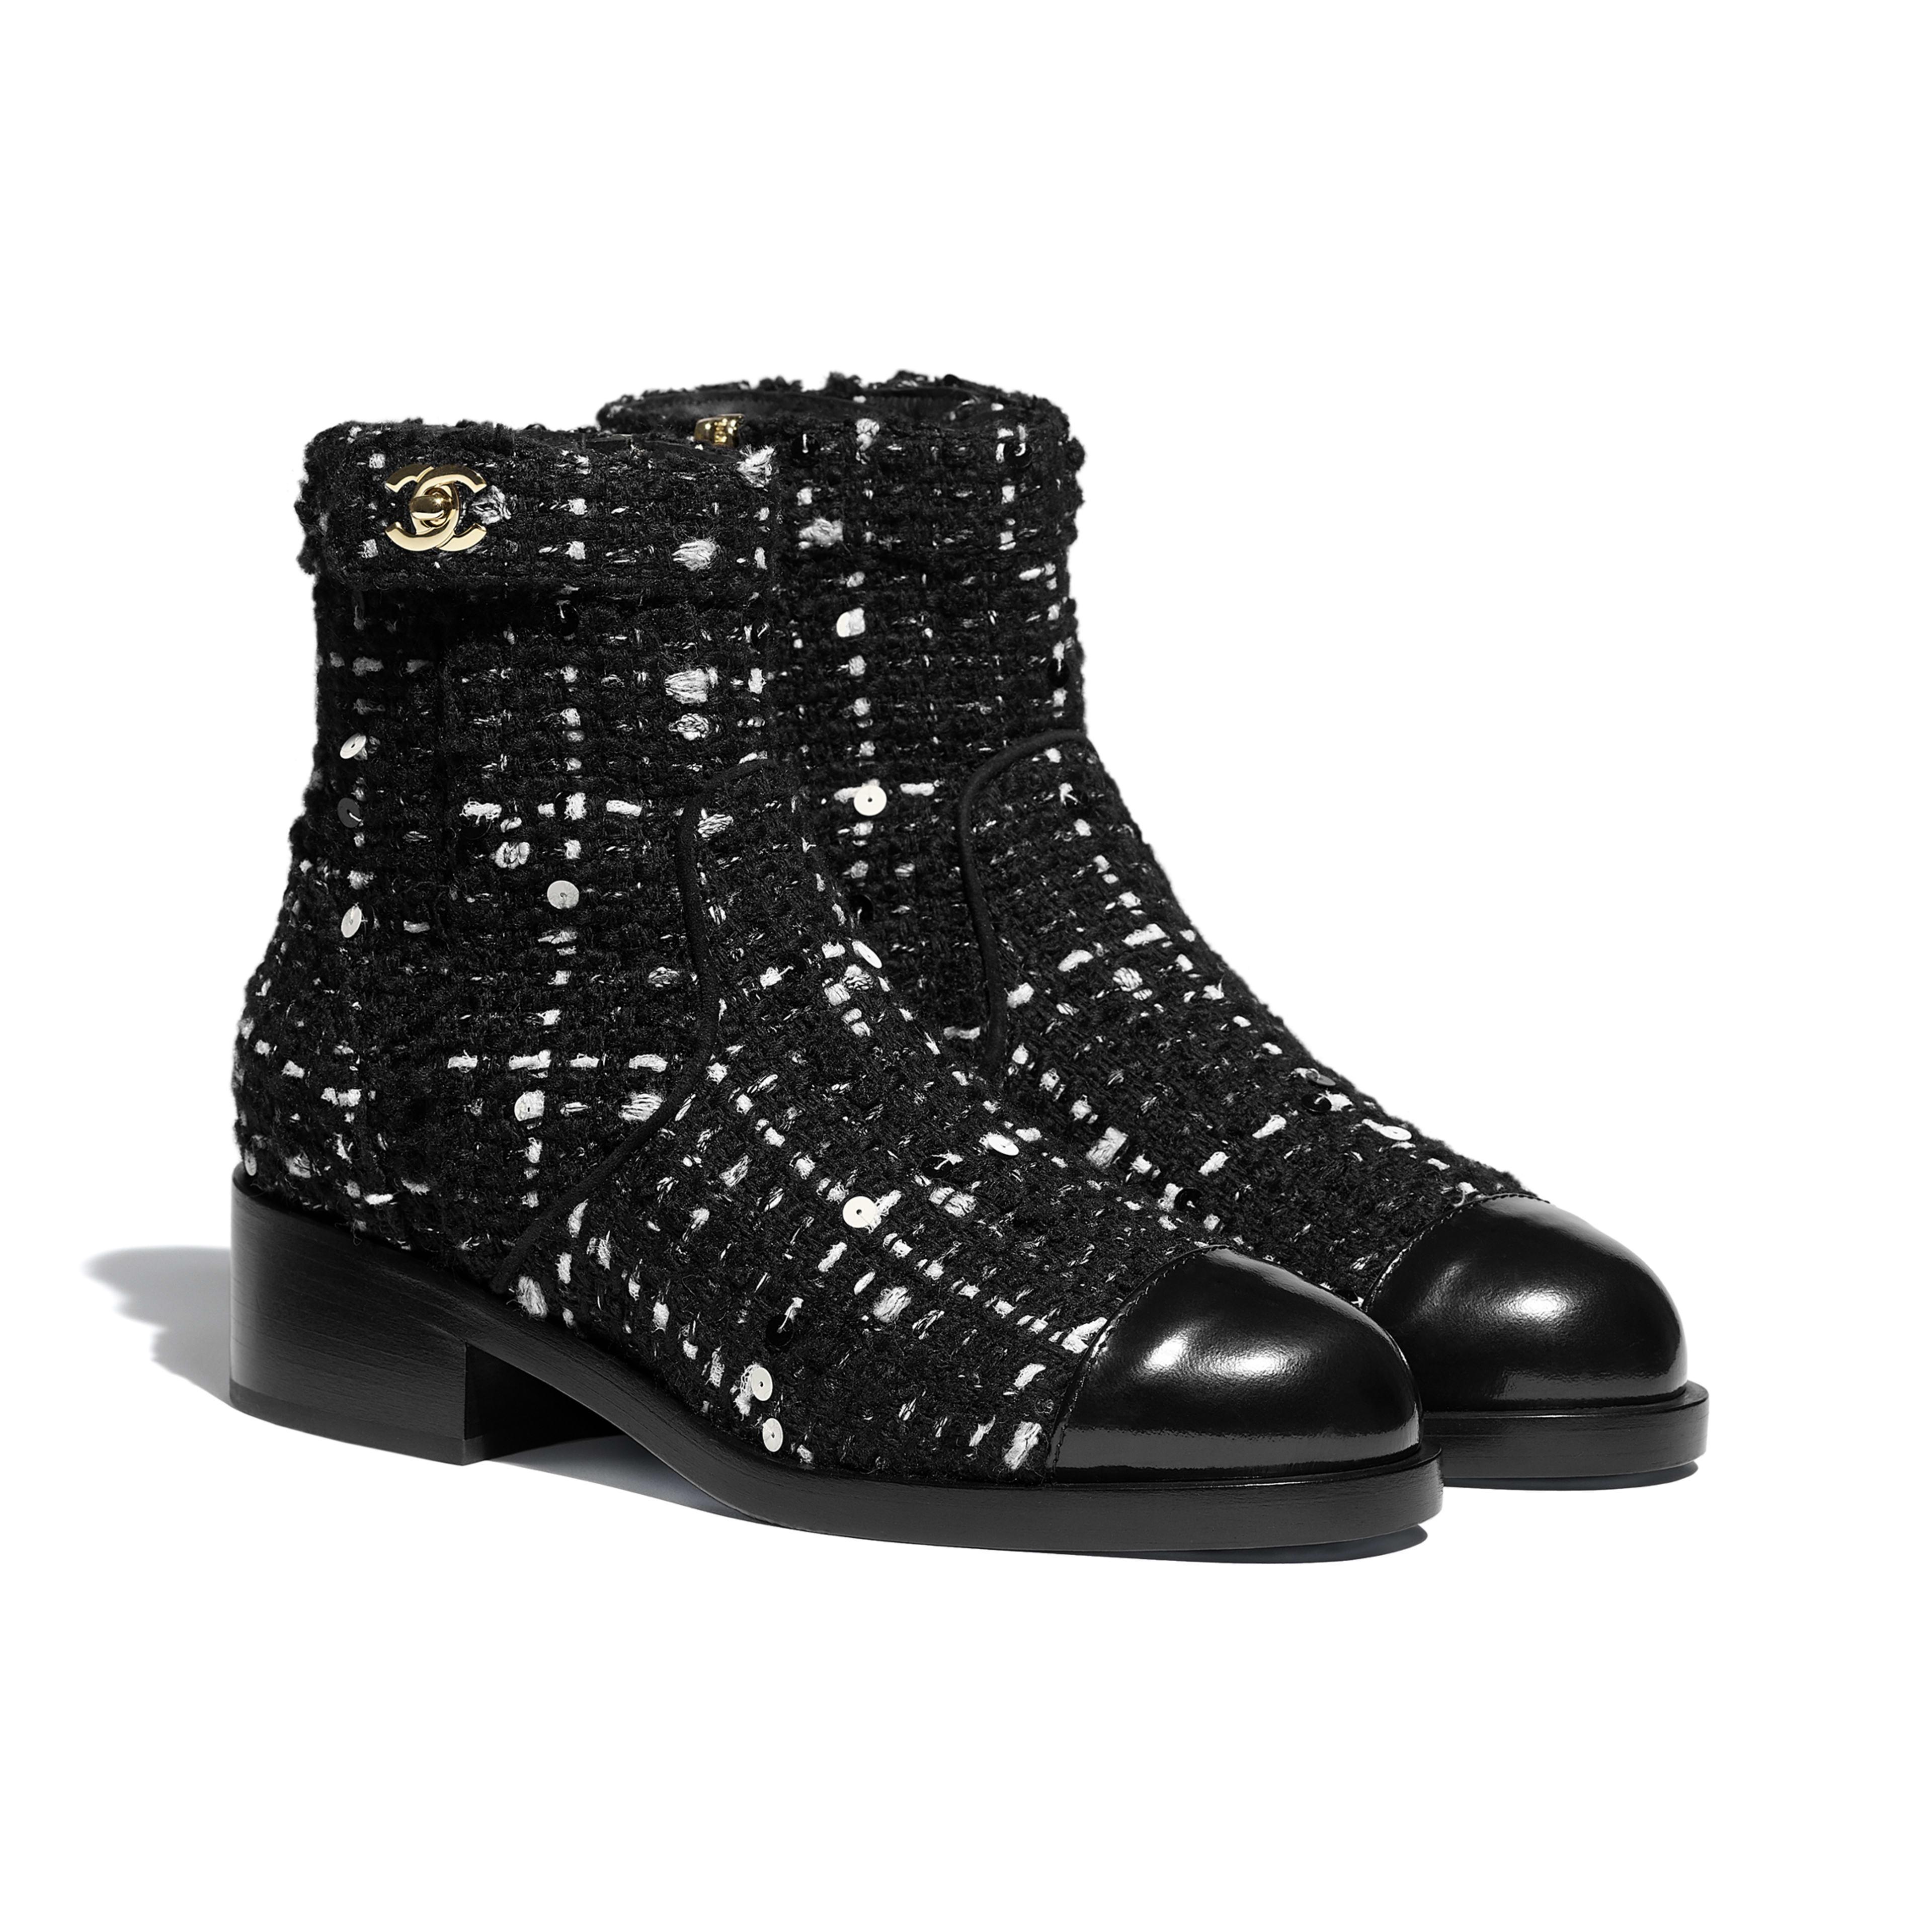 Calfskin Black \u0026 White Ankle Boots | CHANEL